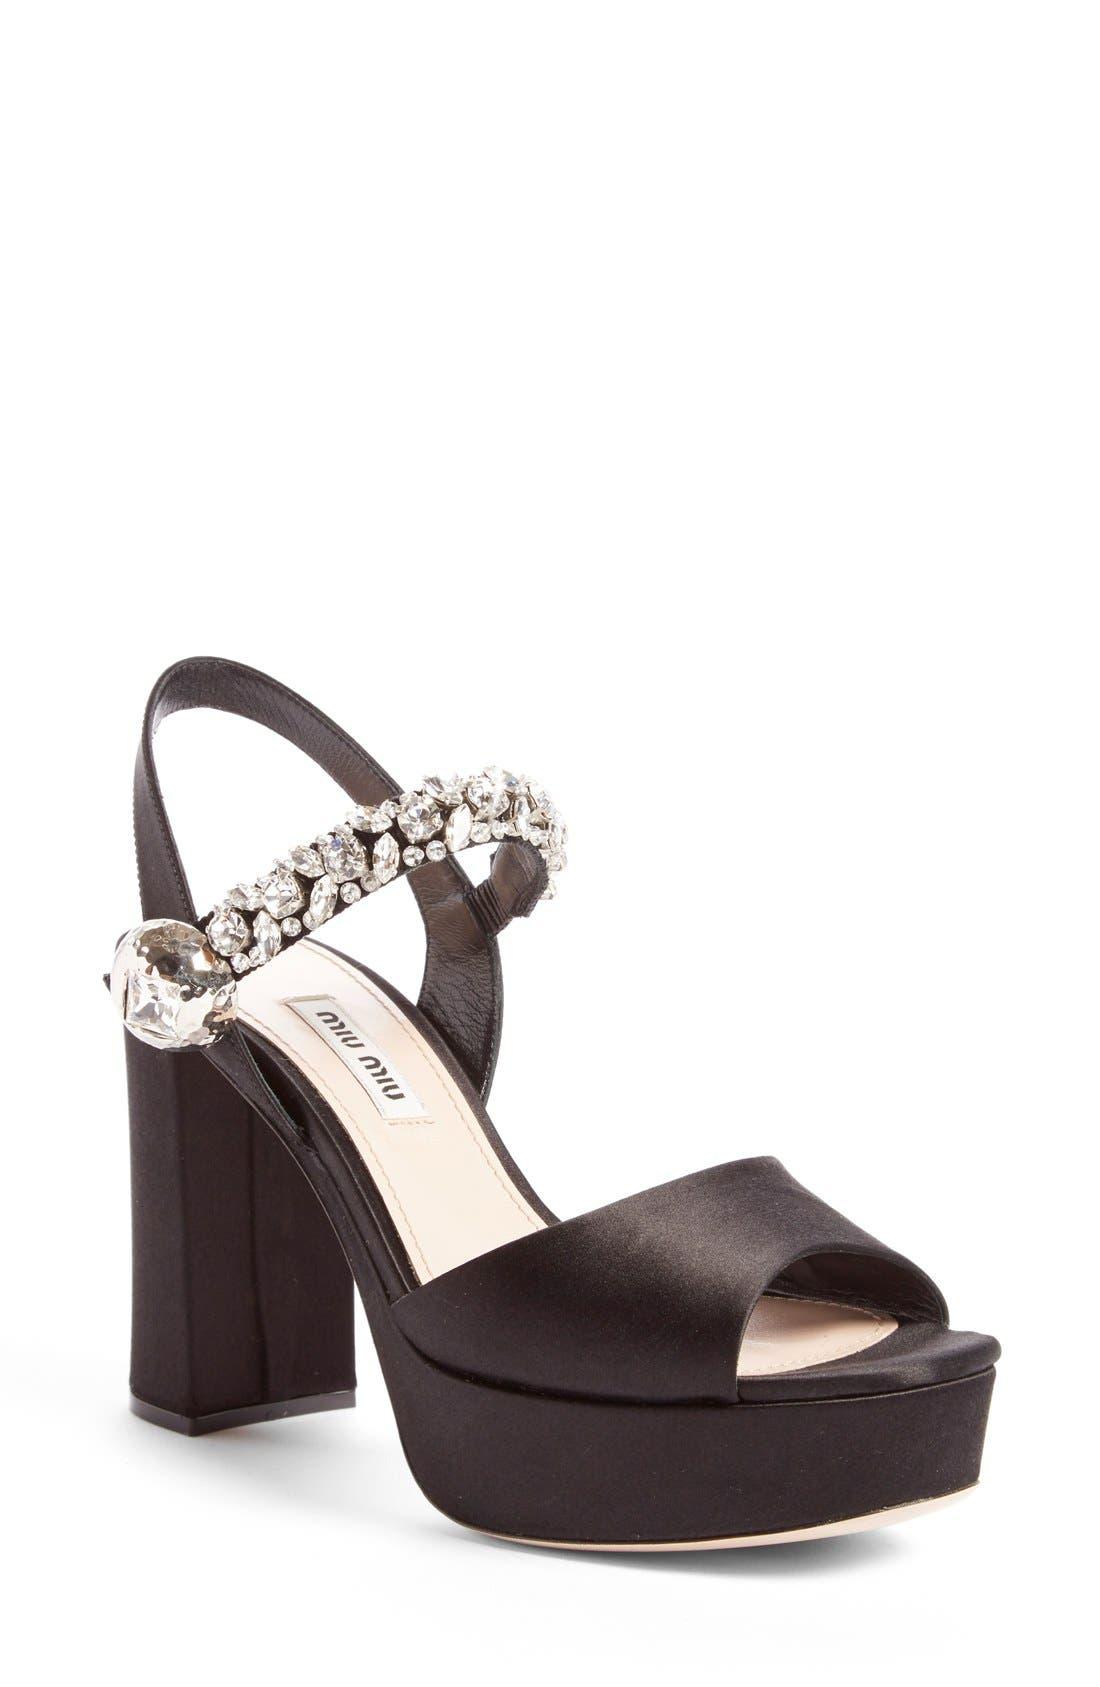 Alternate Image 1 Selected - Miu Miu Crystal Embellished Platform Sandal (Women)